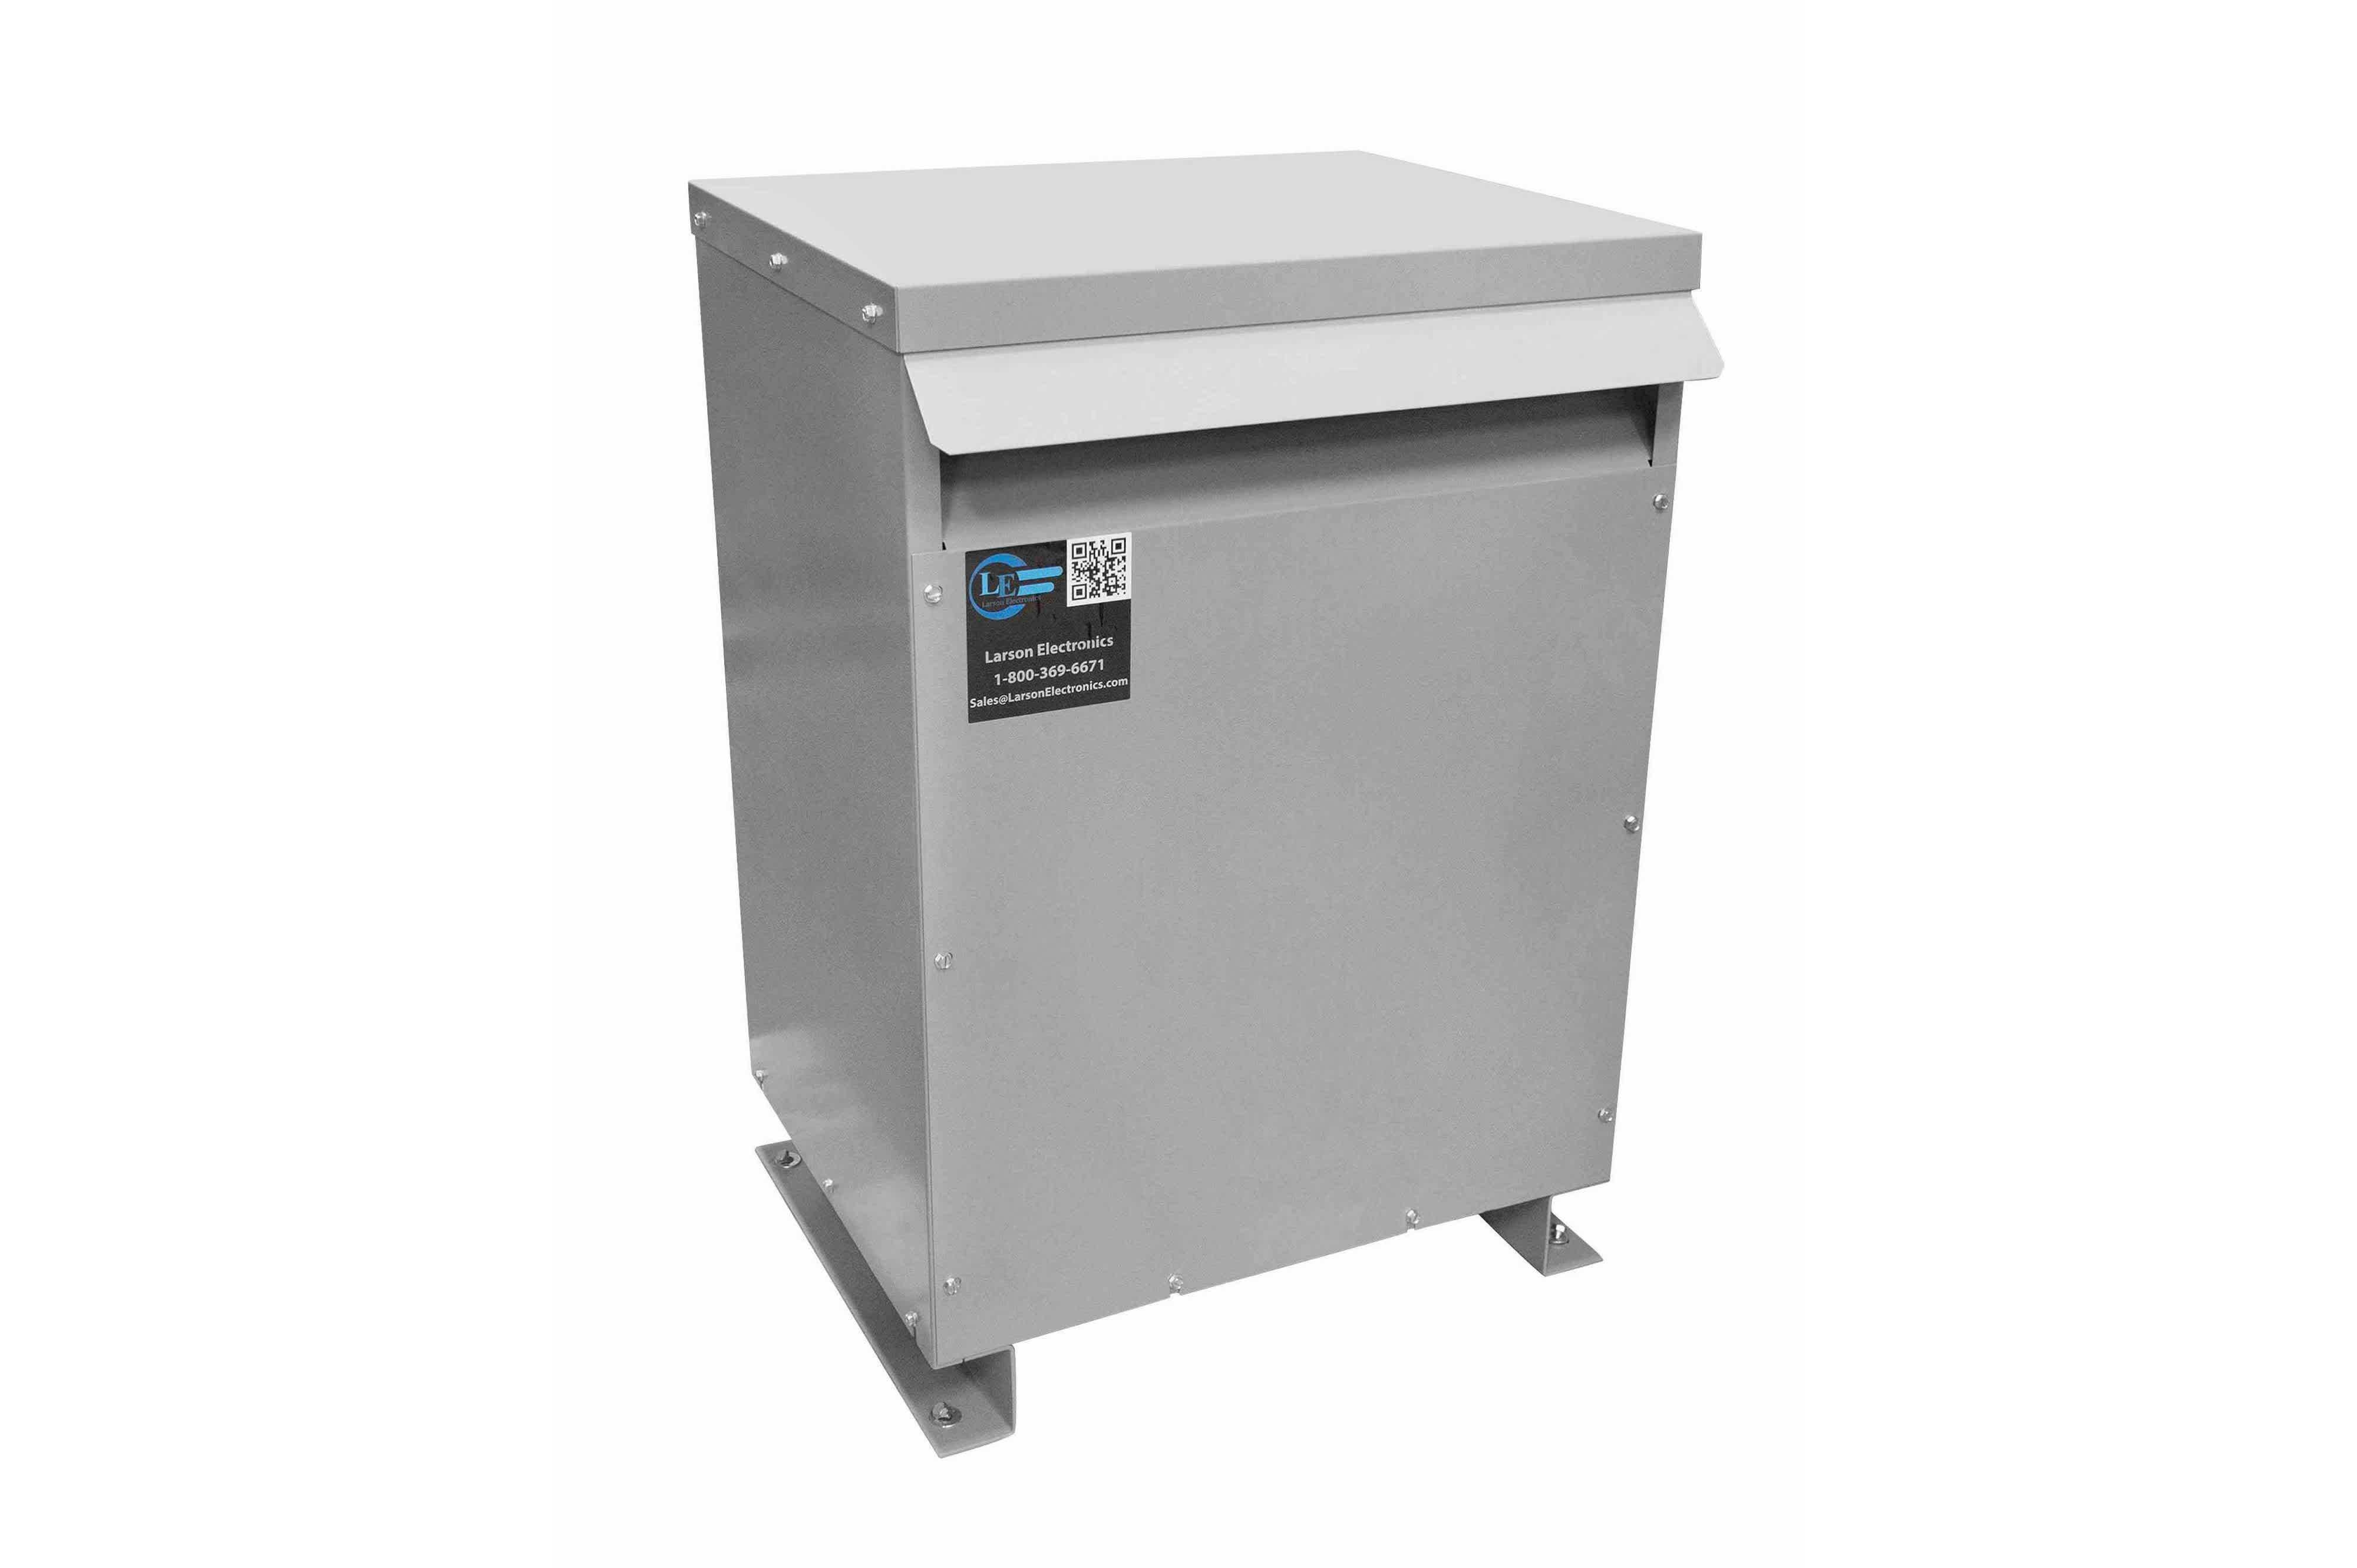 42.5 kVA 3PH Isolation Transformer, 380V Wye Primary, 480V Delta Secondary, N3R, Ventilated, 60 Hz